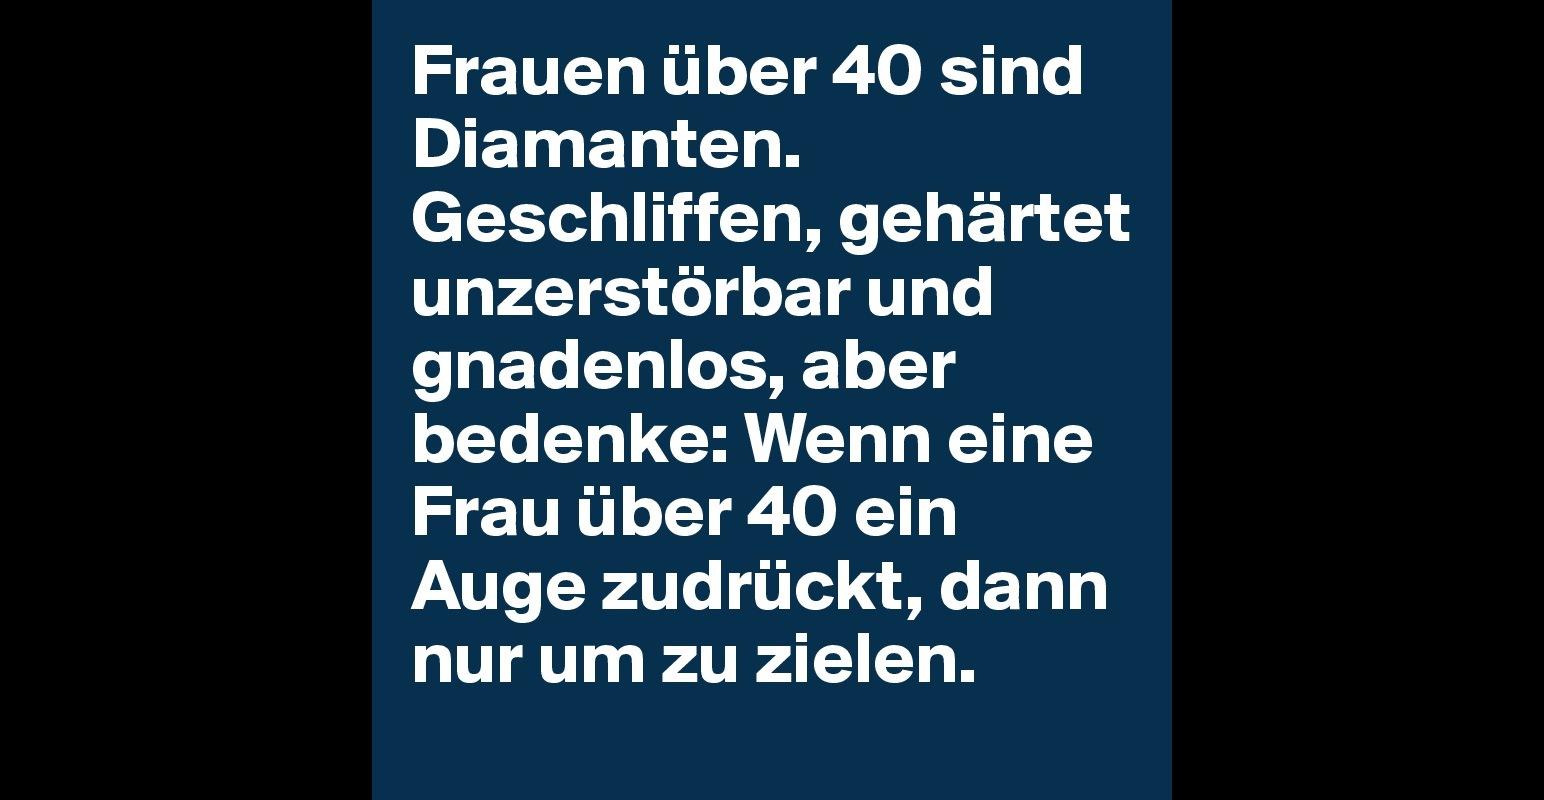 Frau uber 40 partnersuche